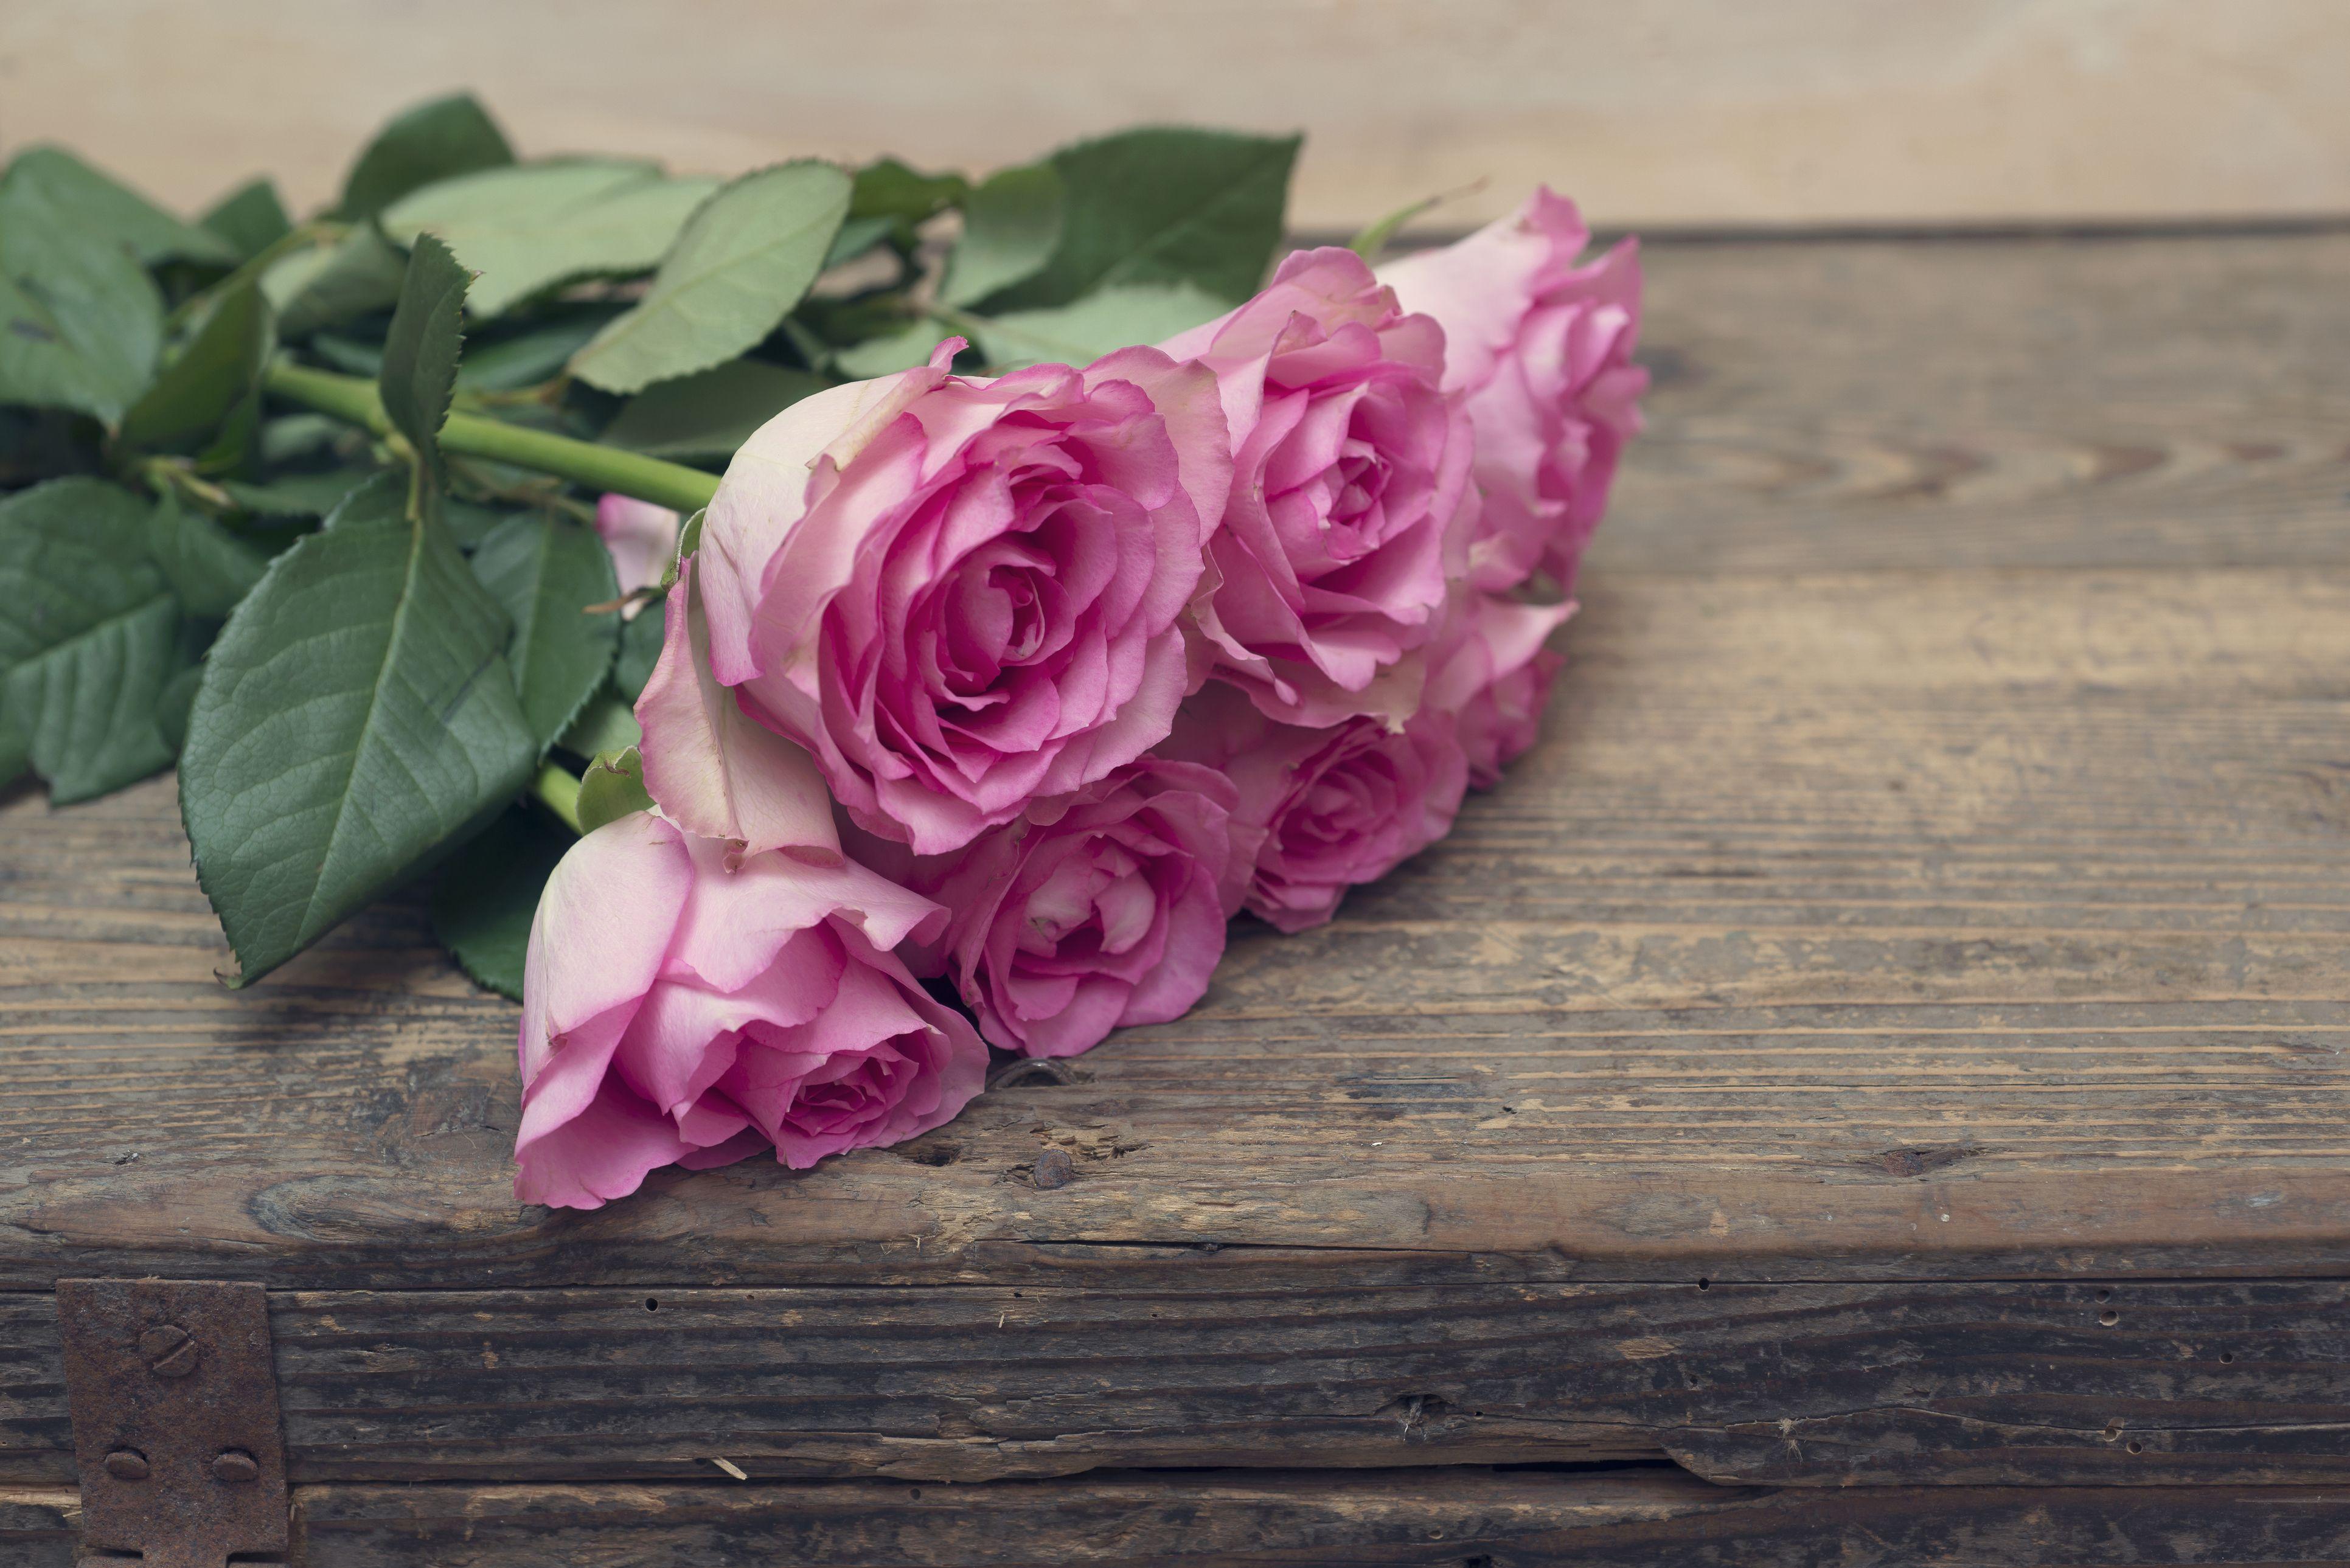 16 romantic flower meanings